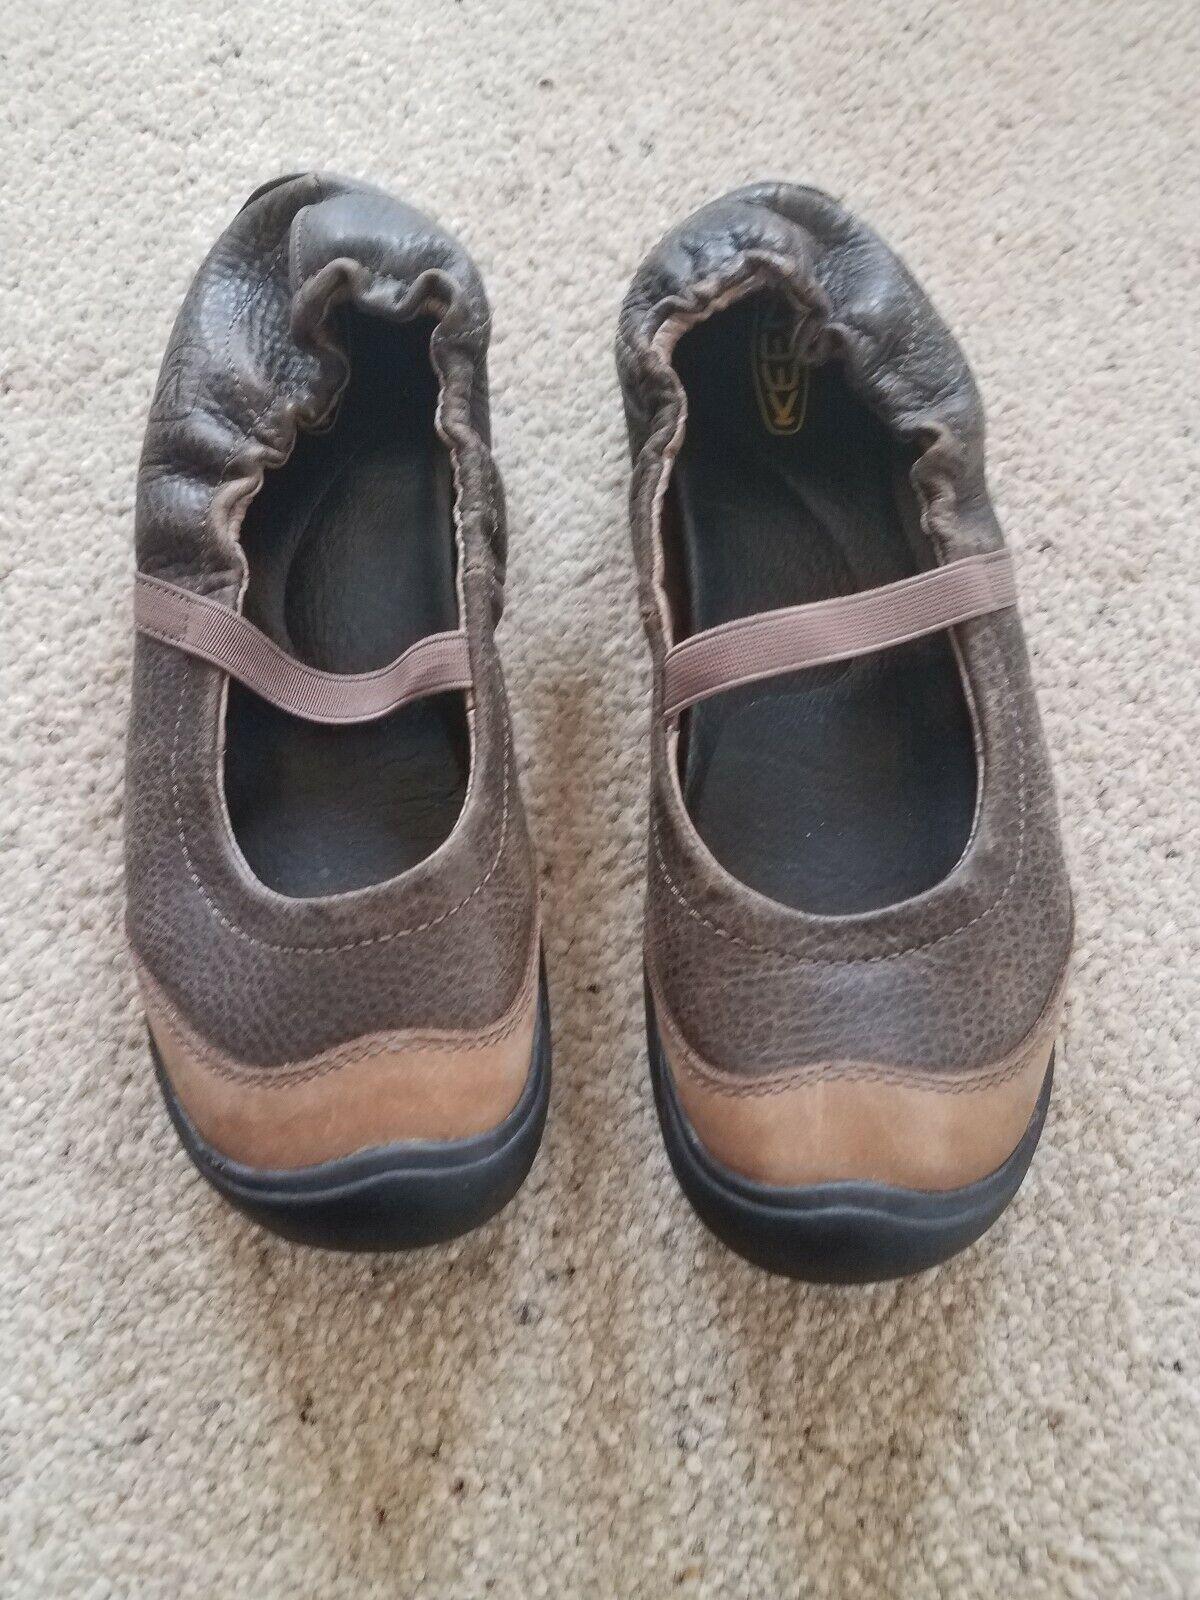 Keen en Cuir Marron Chaussures Plates Mary Jane Chaussures confort FEMME 7.5 excellent état